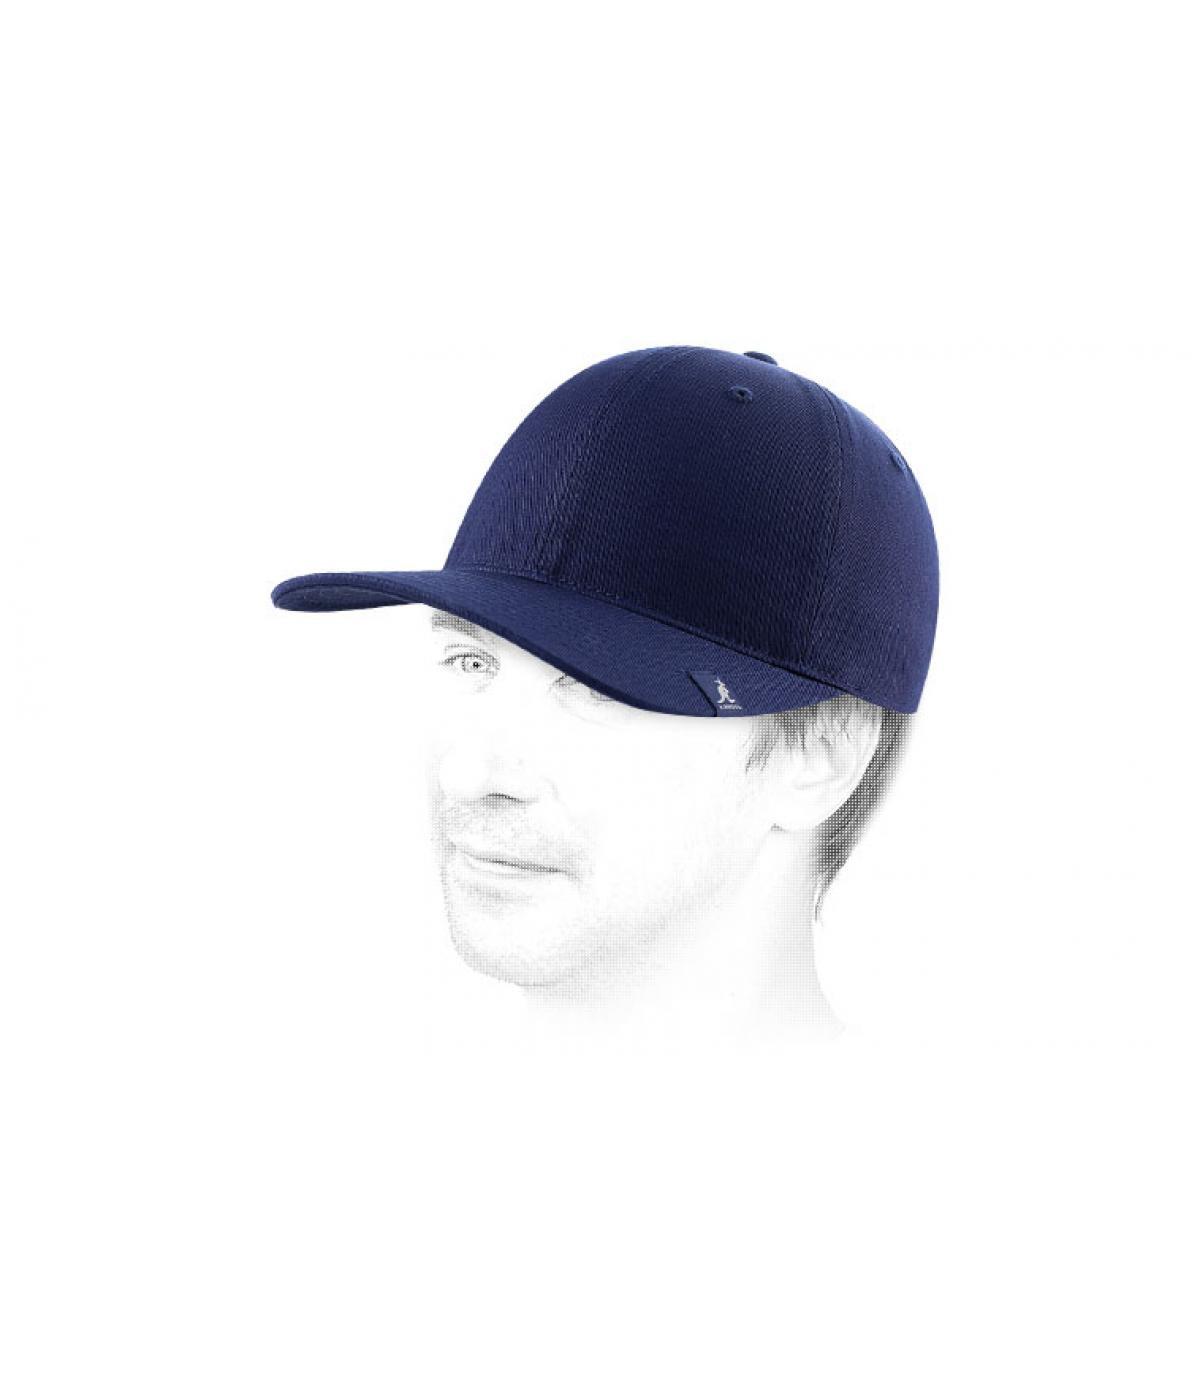 Blauw trucker cap